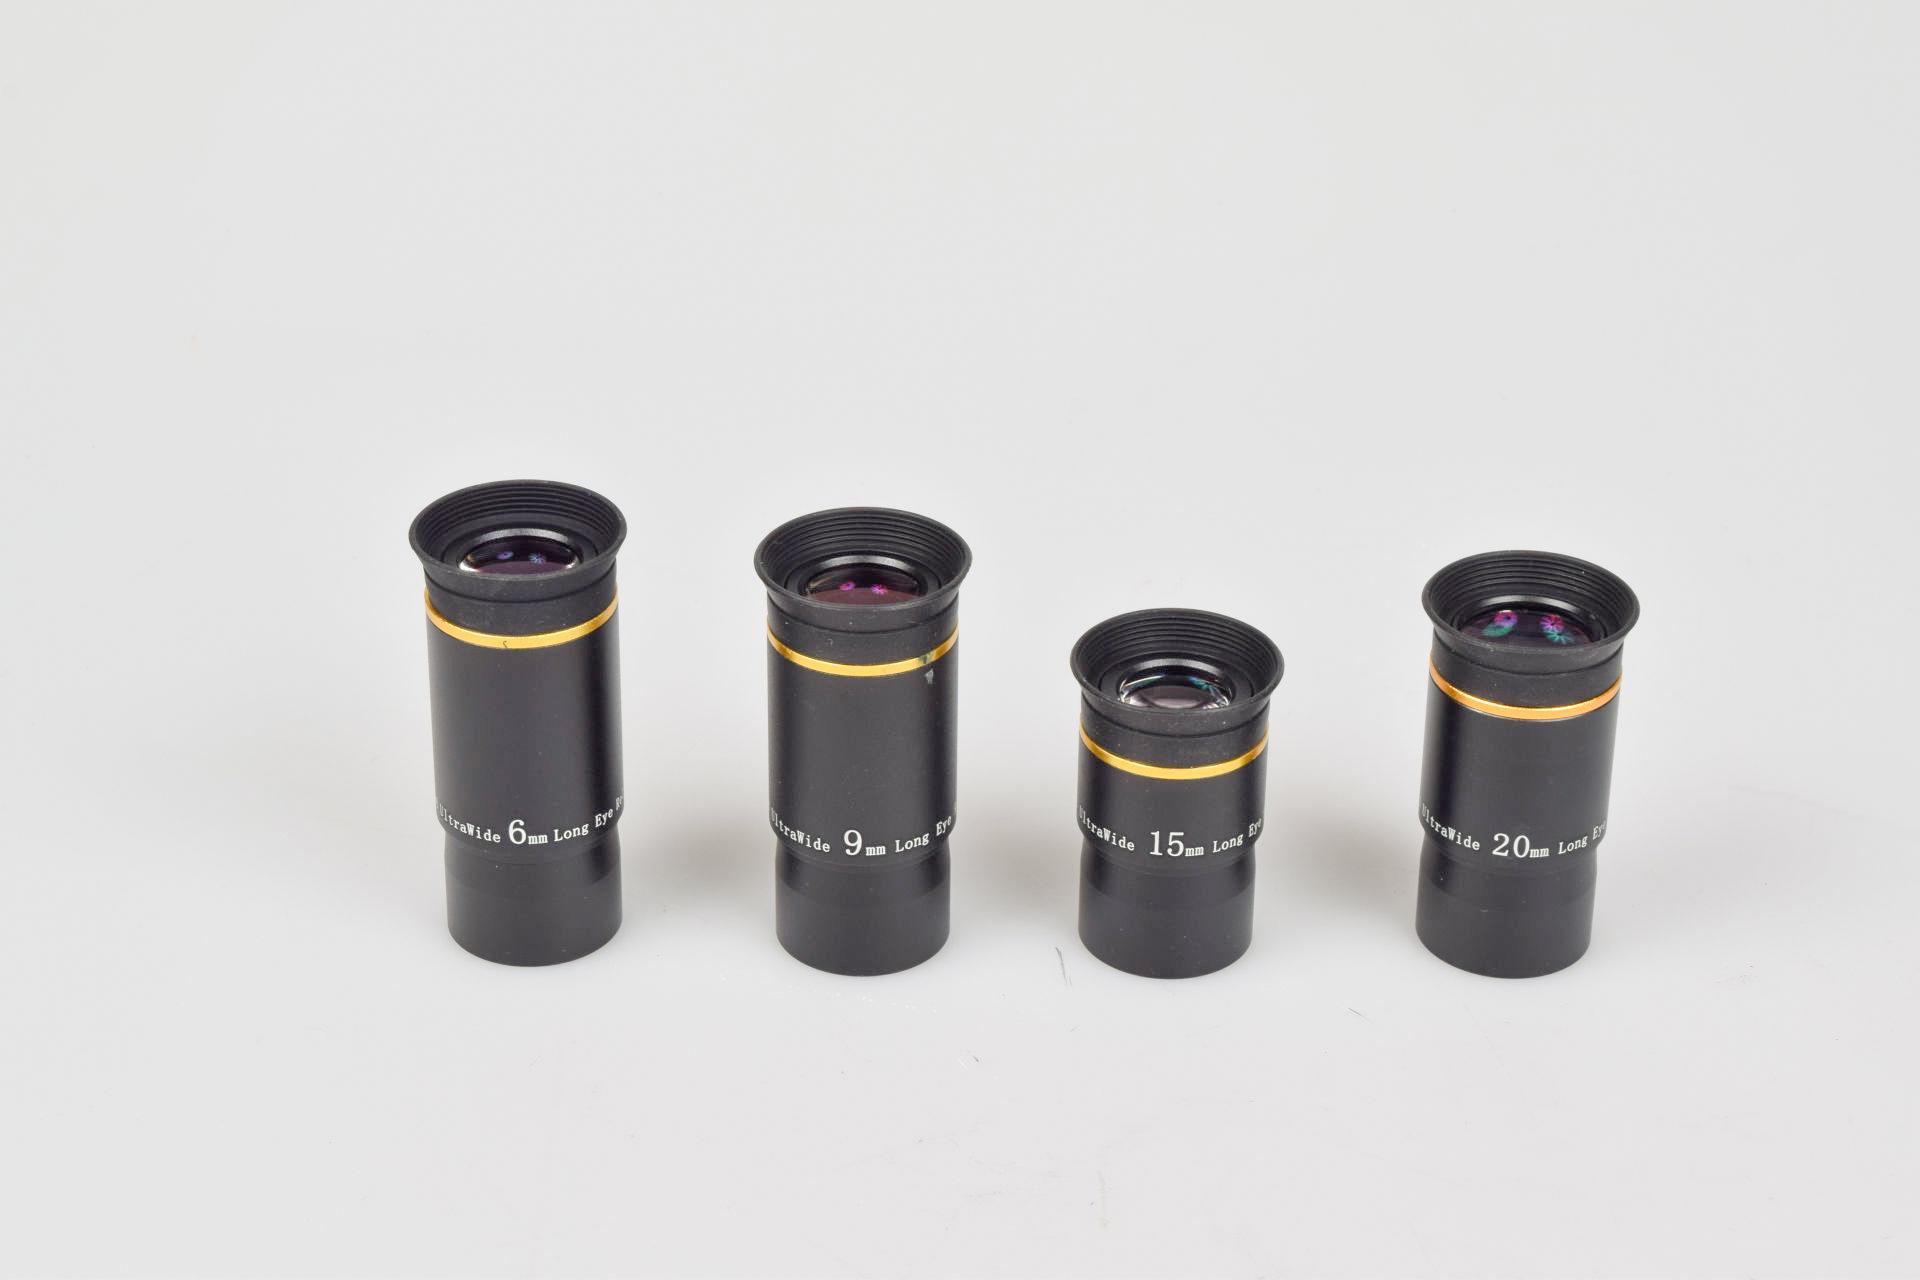 UWアイピースセット(6/9/15/20mm)